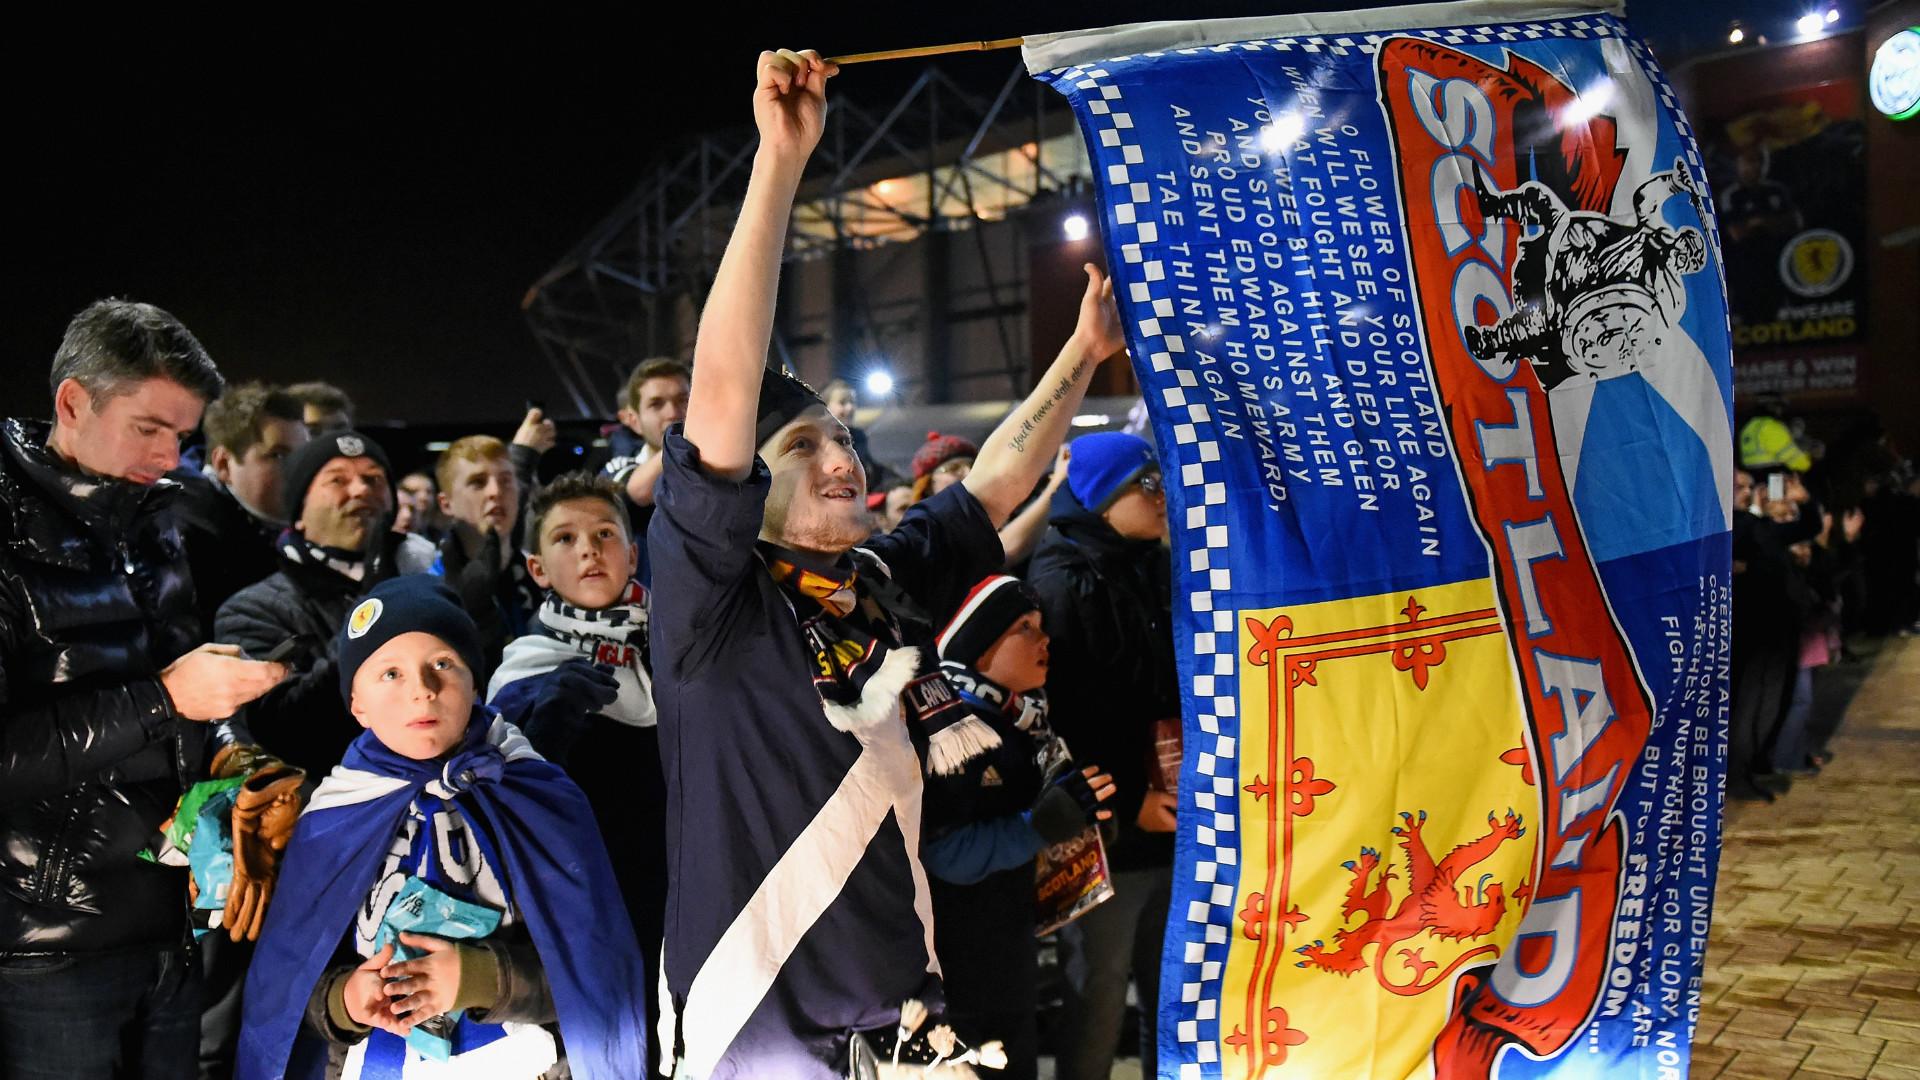 HD Scotland fans 2014